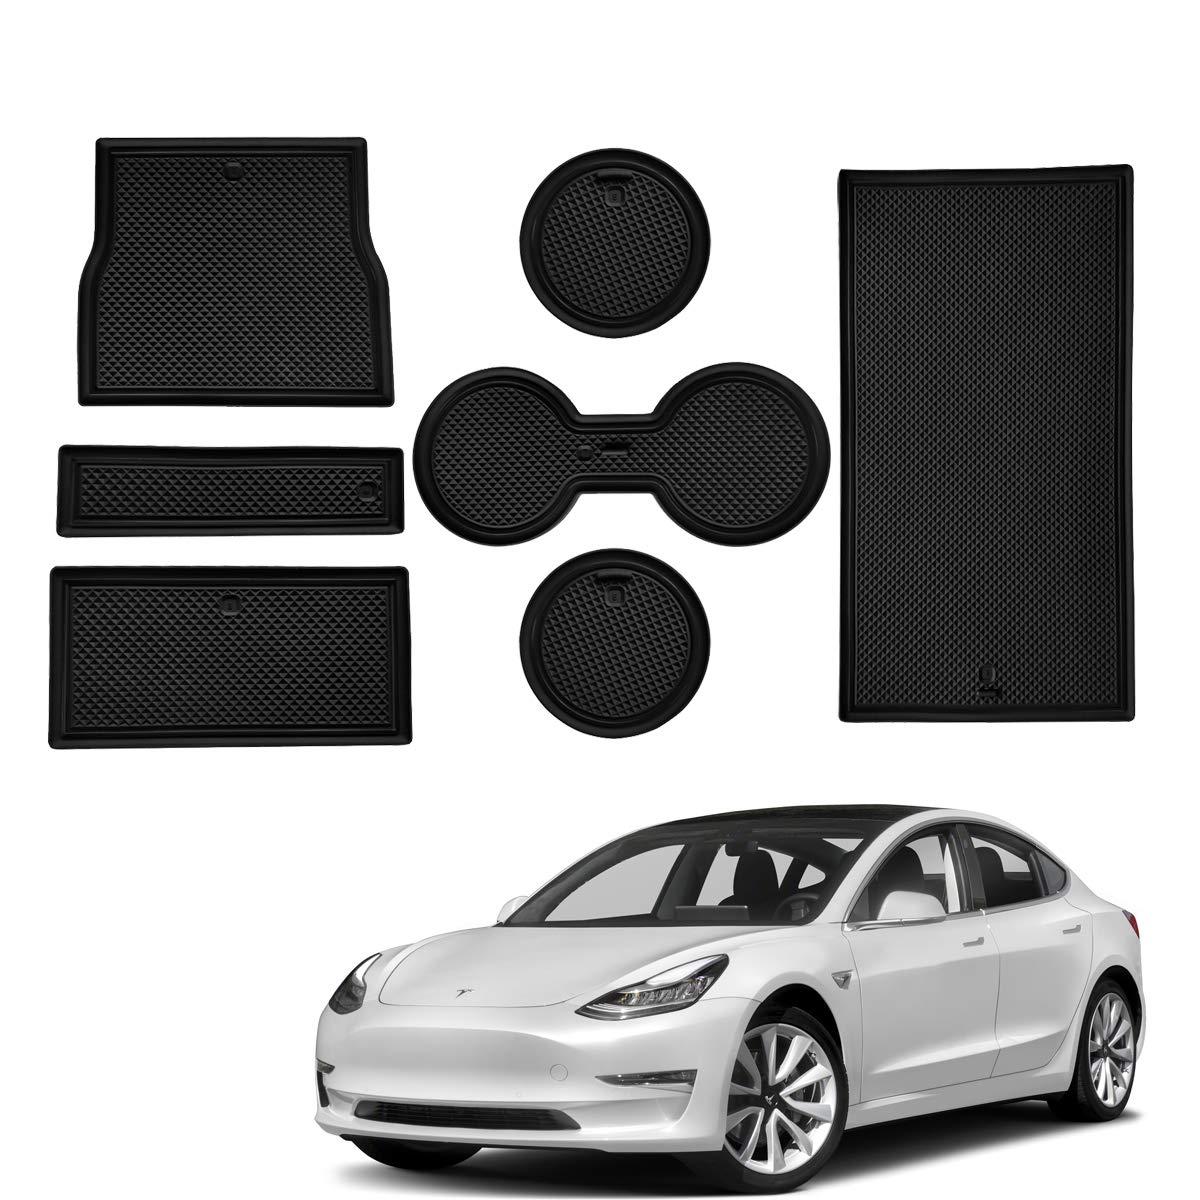 Center Console Cup Holder Interior Liner Anti-Slip Liner Mats for Tesla 2017 2018 2019 Model 3 Door Mats Accessories Intget White Glow in Dark